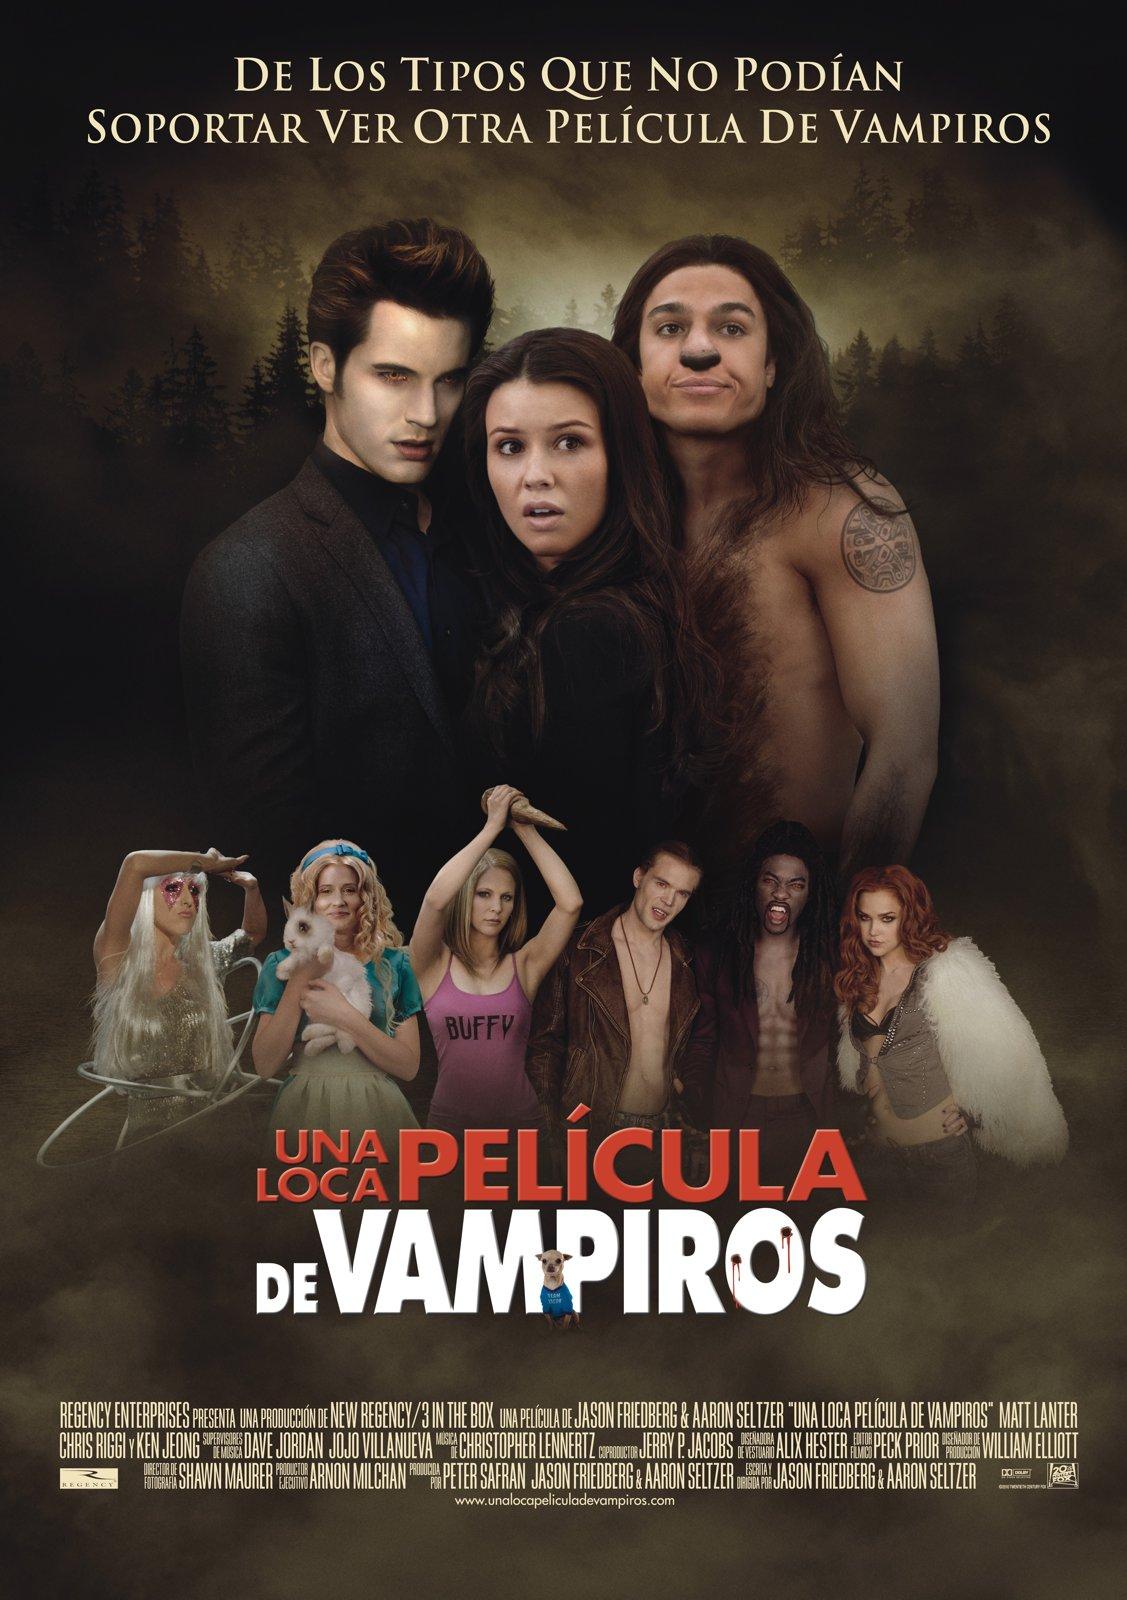 http://3.bp.blogspot.com/_OTq6s1gvQgI/TM7JJJO6DmI/AAAAAAAAAqM/HThJmhmOfdA/s1600/Vampires+Suck.jpg